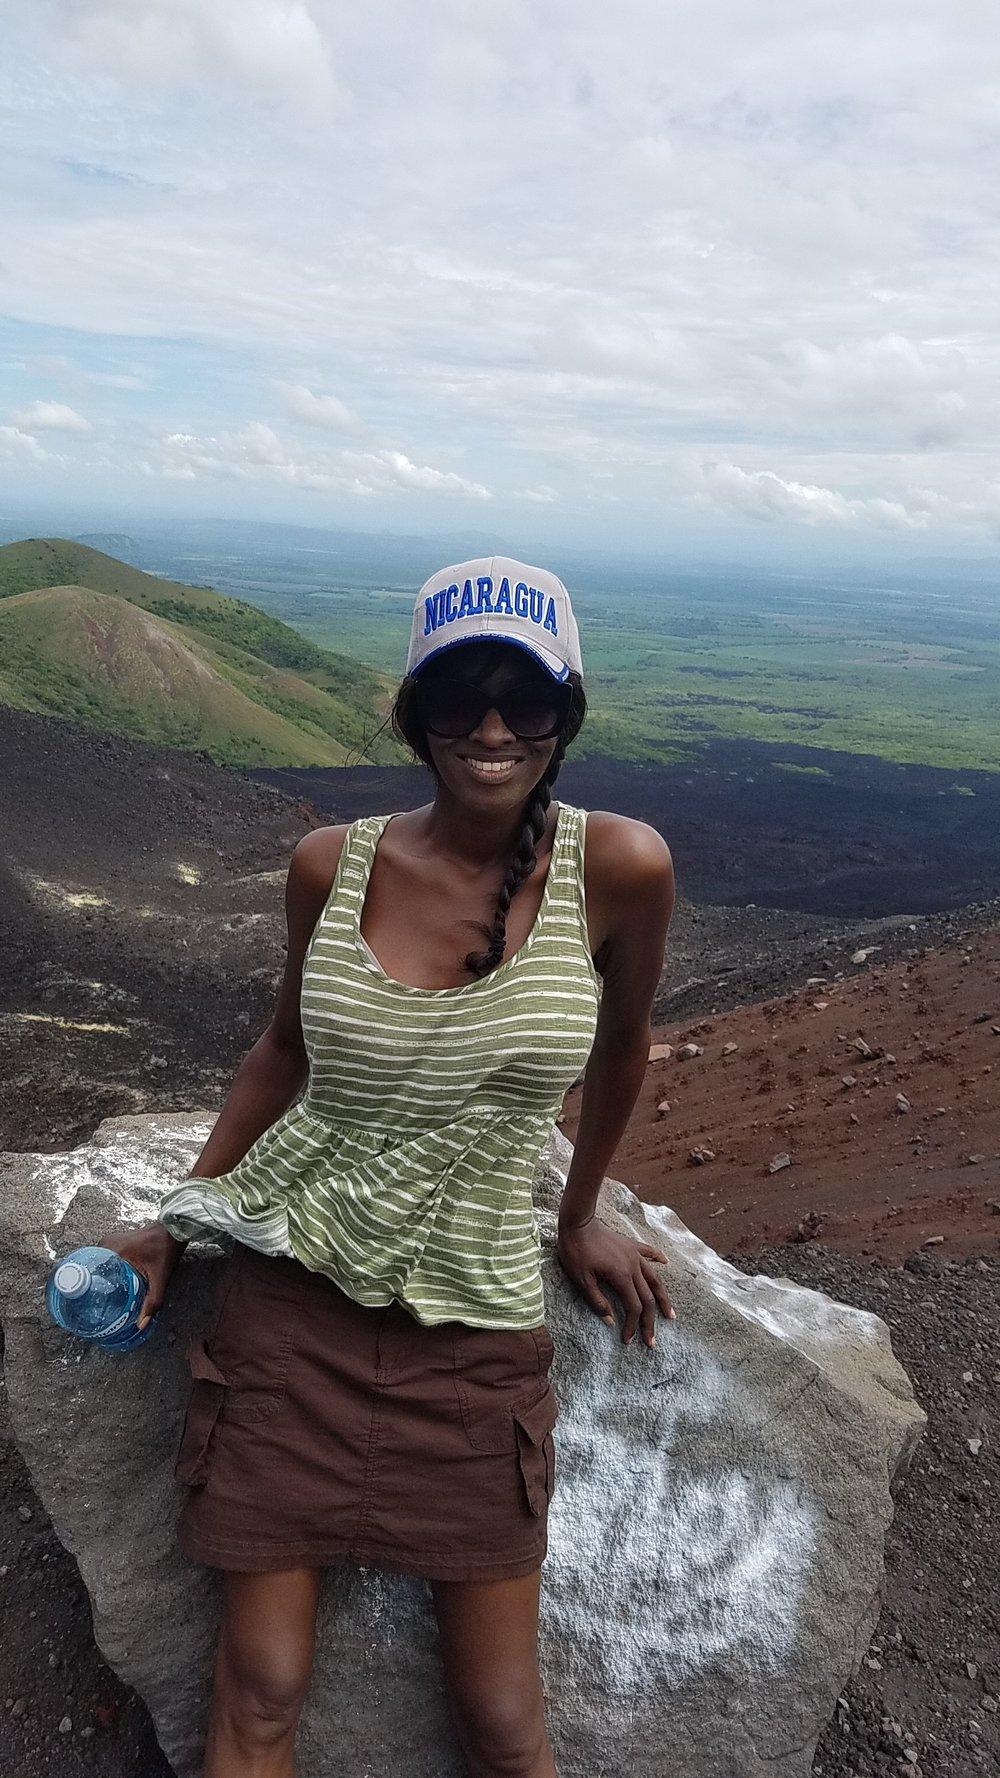 Taking a break (one of many) on Cerro Negro.